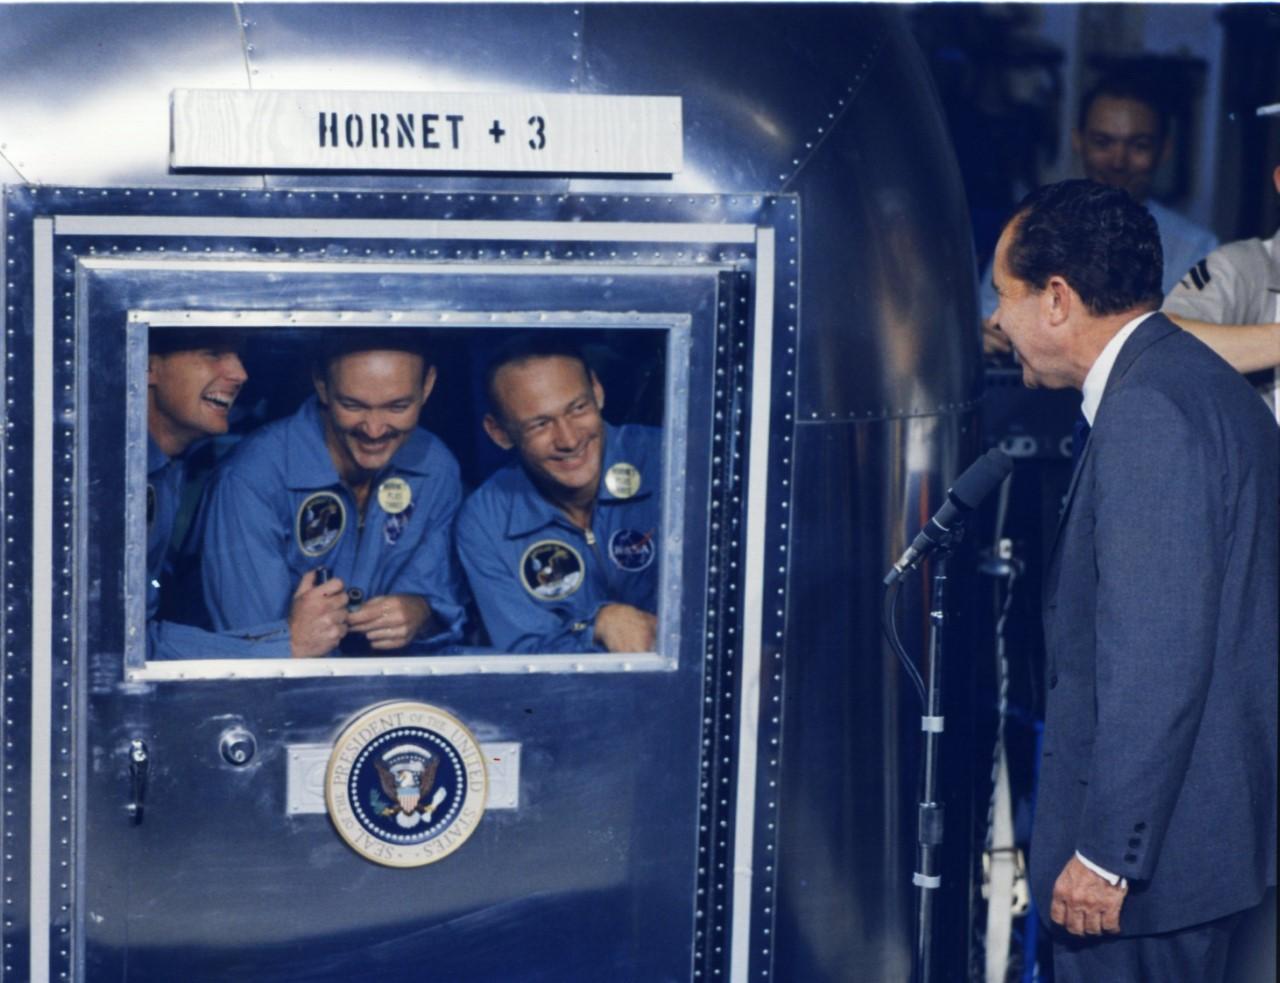 thumbnail_nixon greets astronauts.jpg